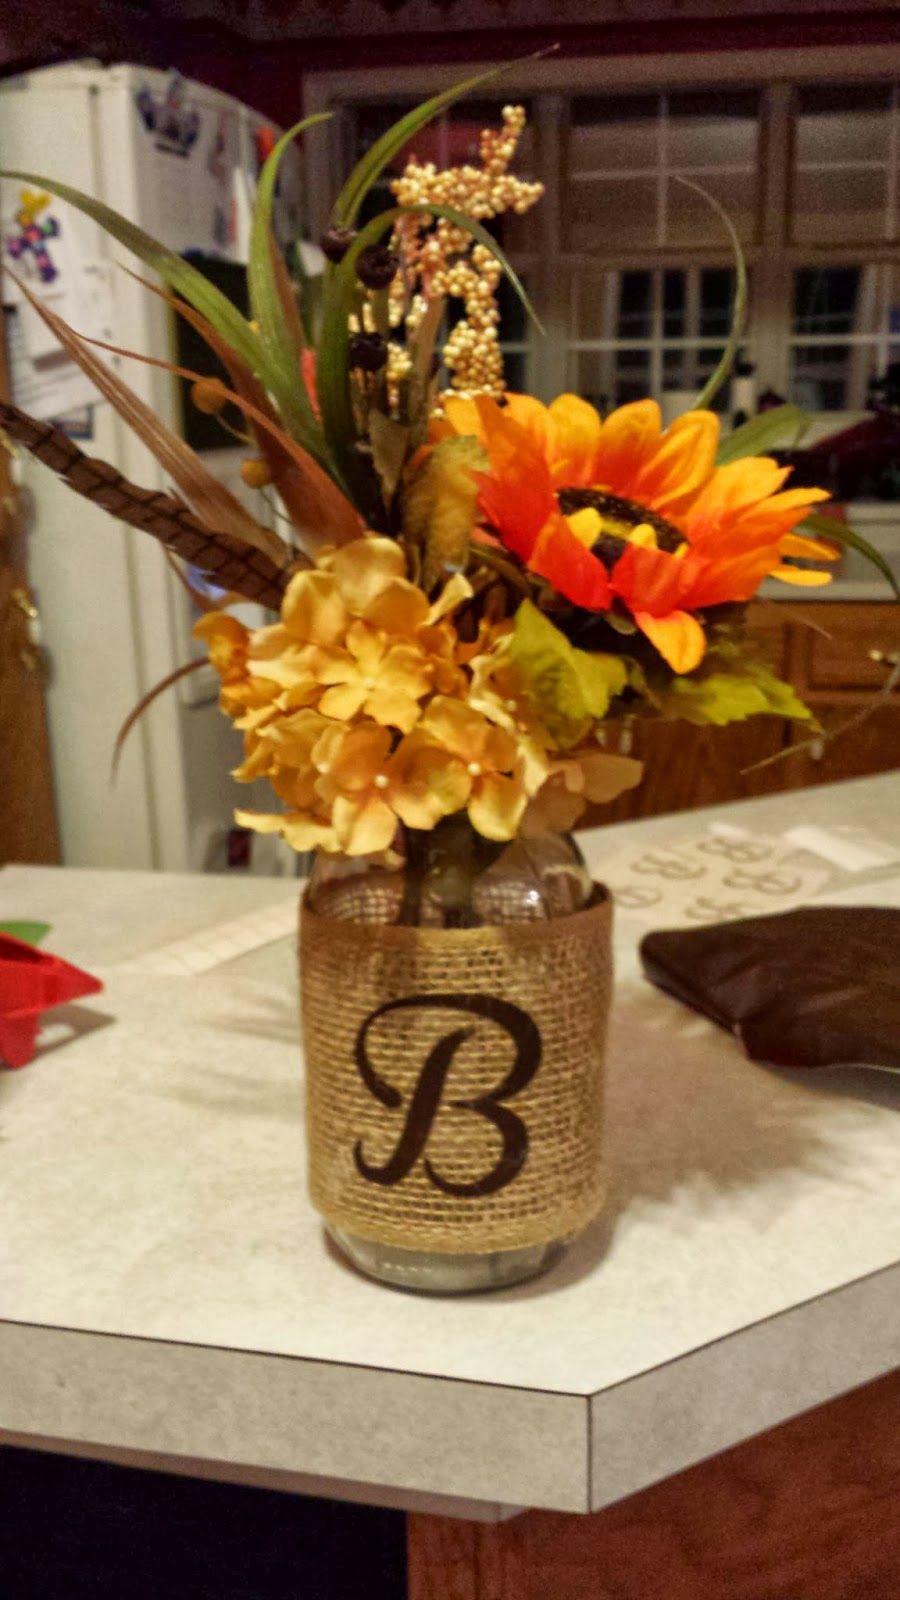 Simply Silent Saturday 10/19/13 | Fall wedding decorations ...